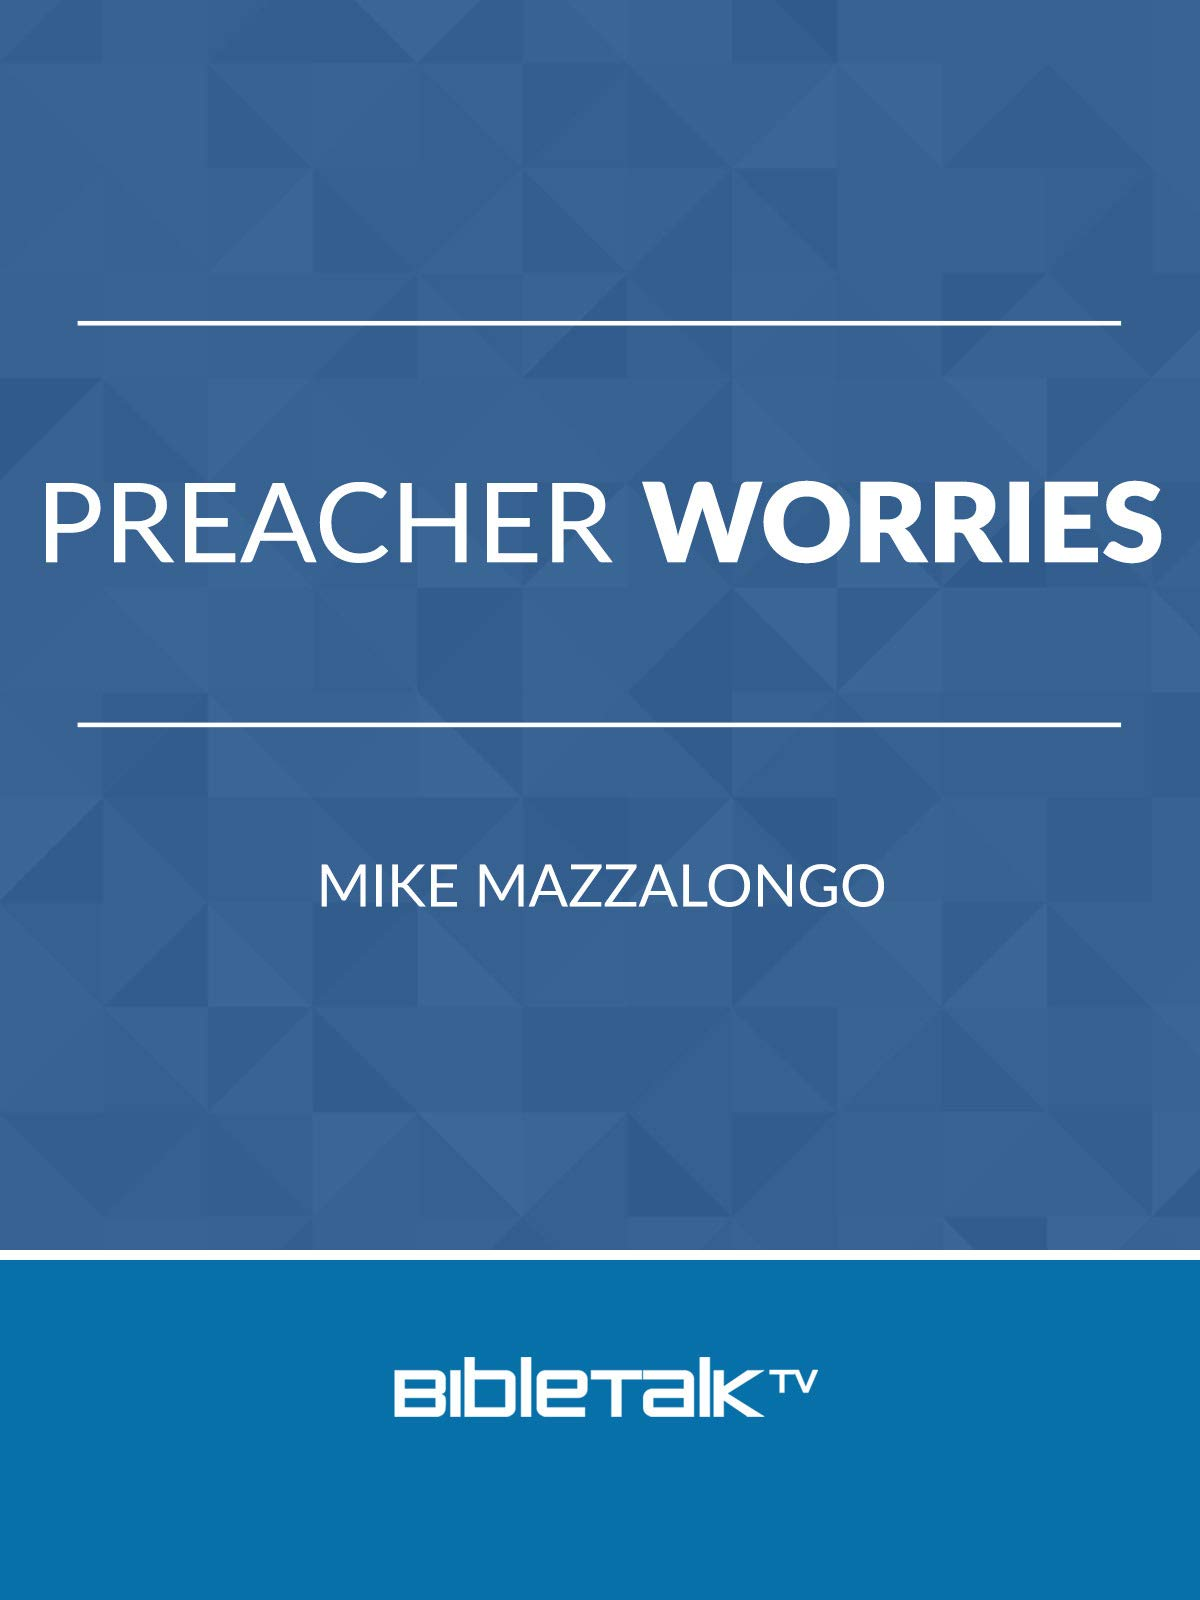 Preacher Worries